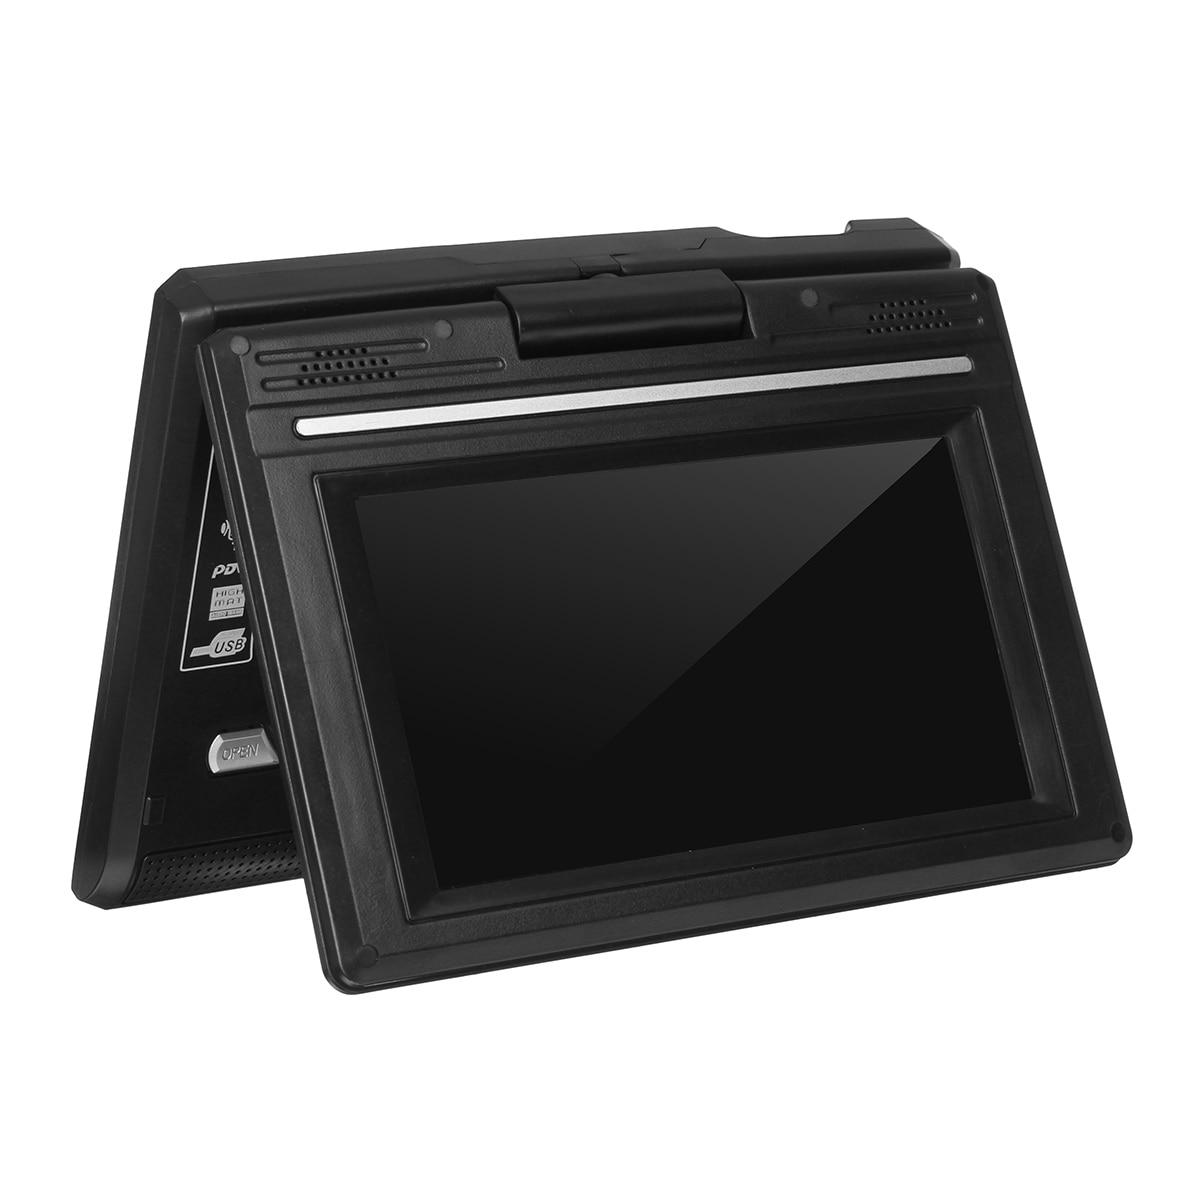 Portátil de 7,8 pulgadas HD TV casa coche reproductor de DVD VCD CD MP3 DVD USB SD reproductor de tarjetas RCA TV Portatil juego de Cable 16:9 pantalla LCD giratoria - 2